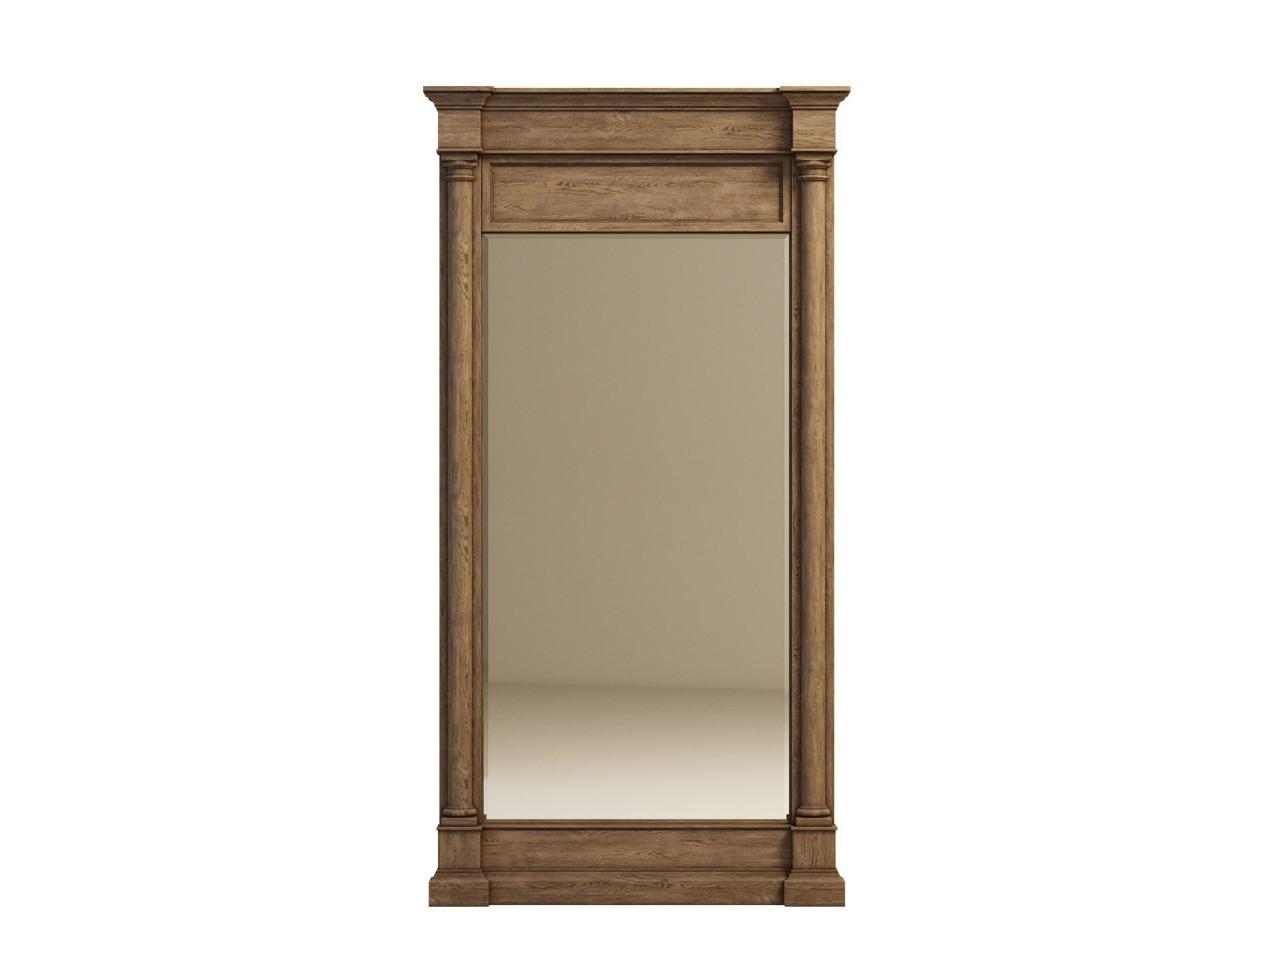 Зеркало RachelНастенные зеркала<br><br><br>Material: Стекло<br>Ширина см: 120<br>Высота см: 230<br>Глубина см: 13